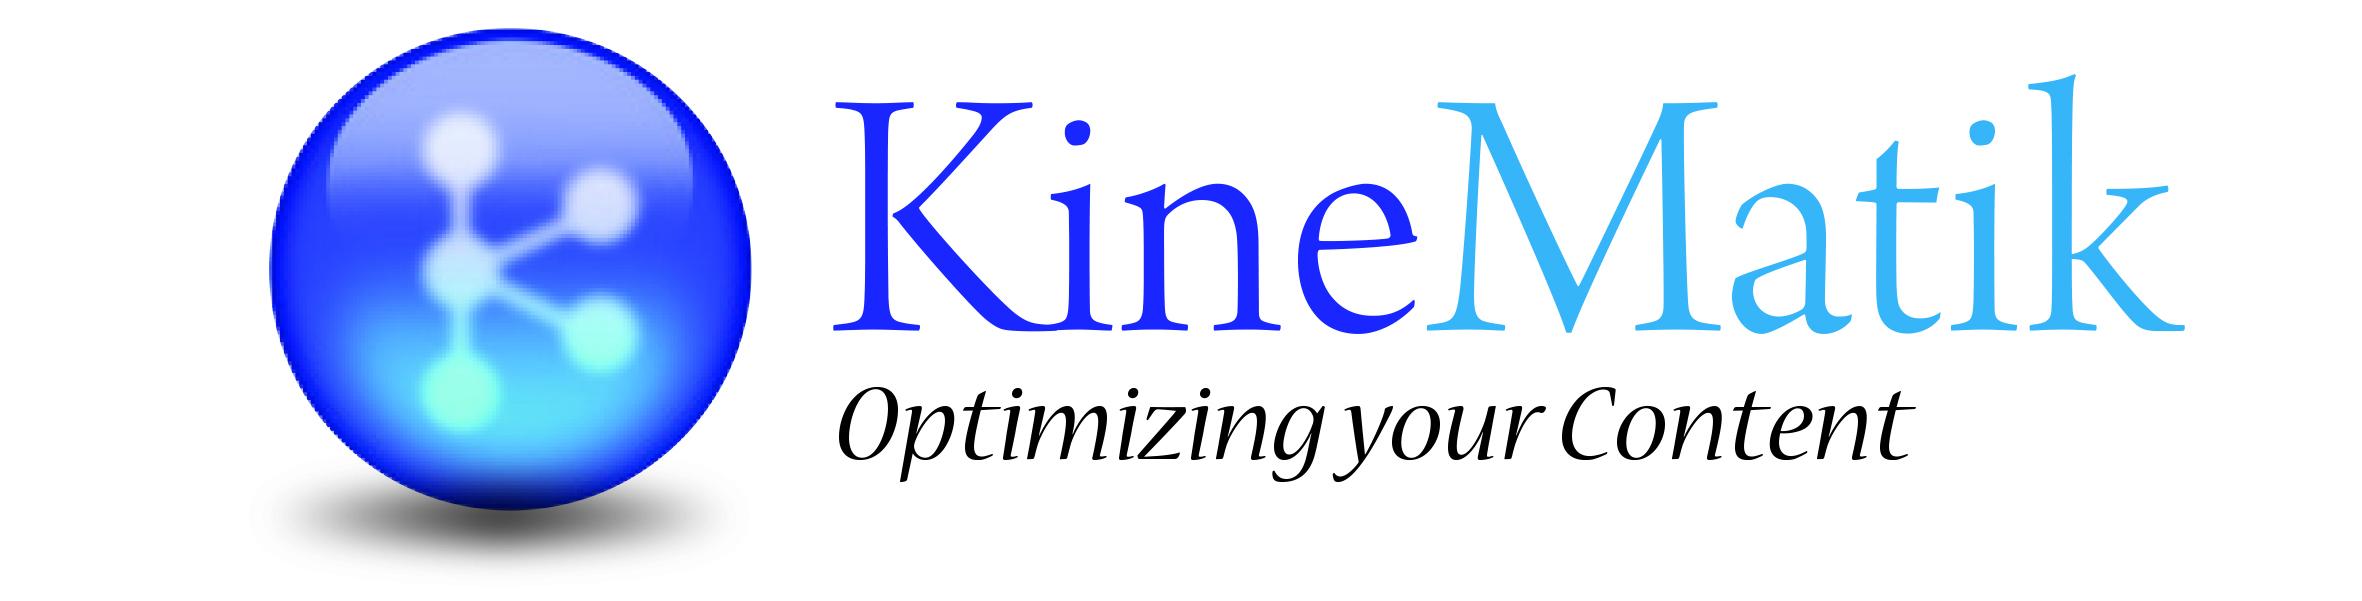 kinematik EMC logo (002).jpg